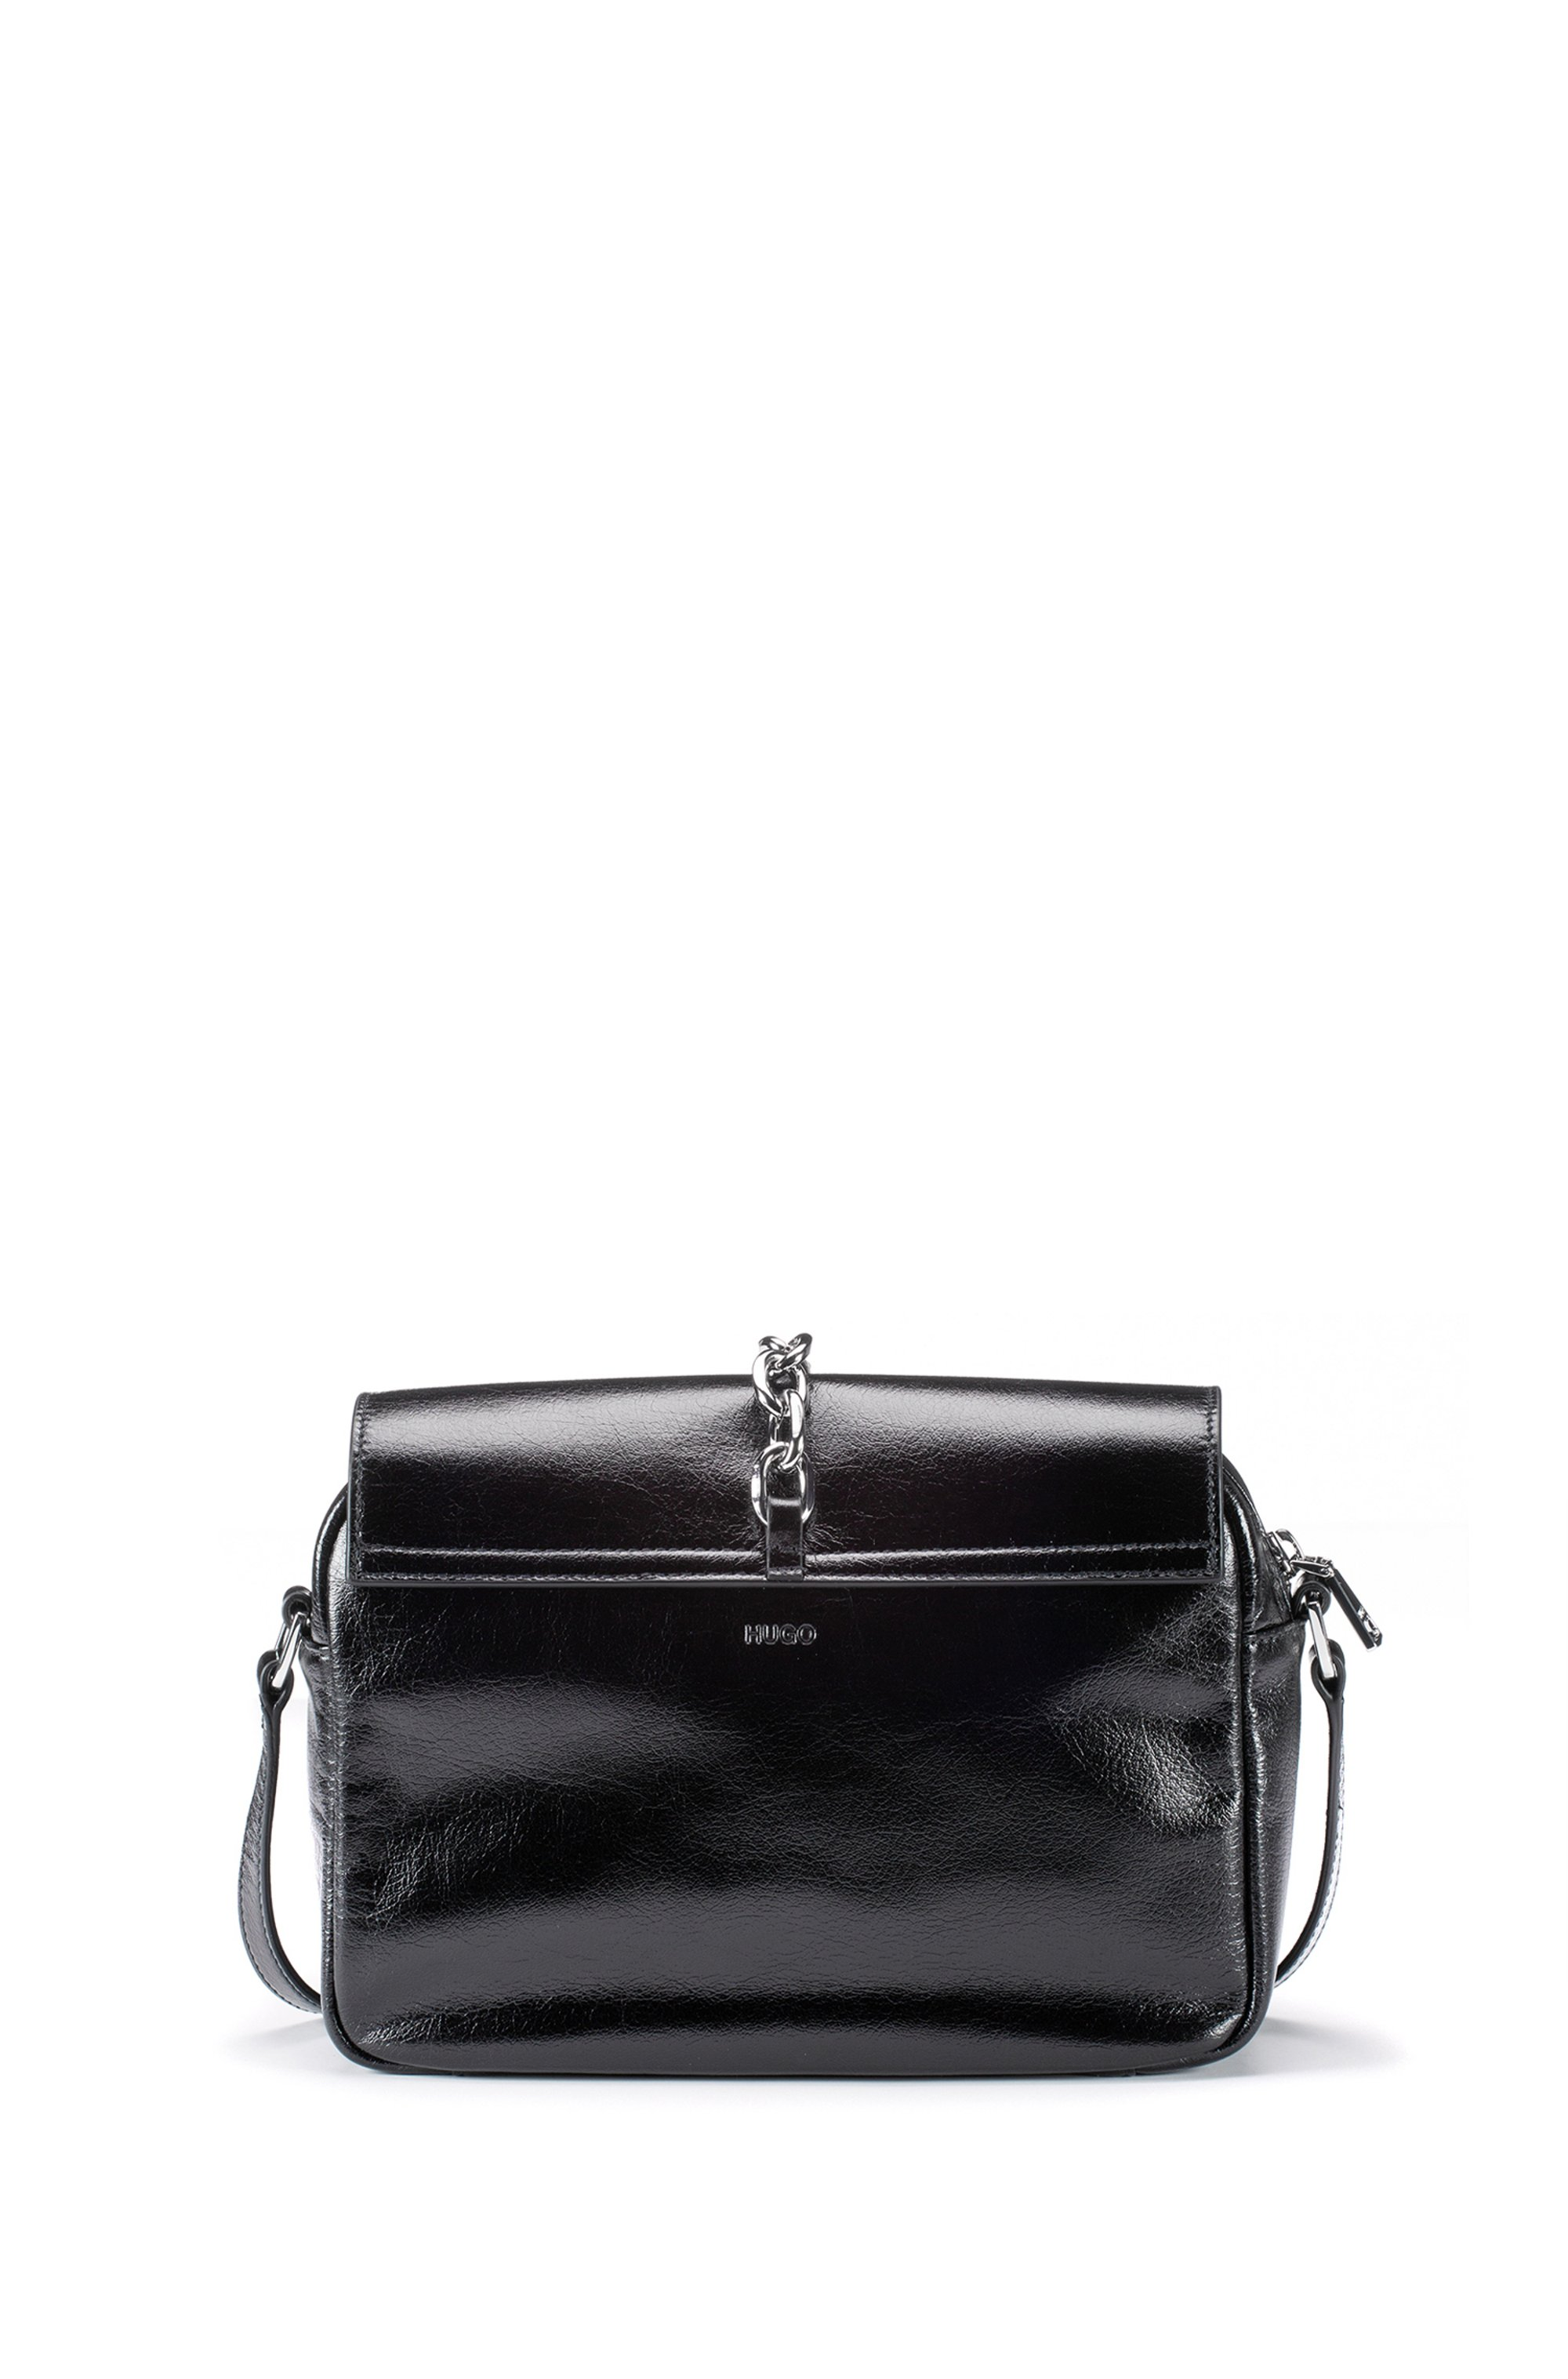 Glossy-leather saddle bag with polished-metal chain trim